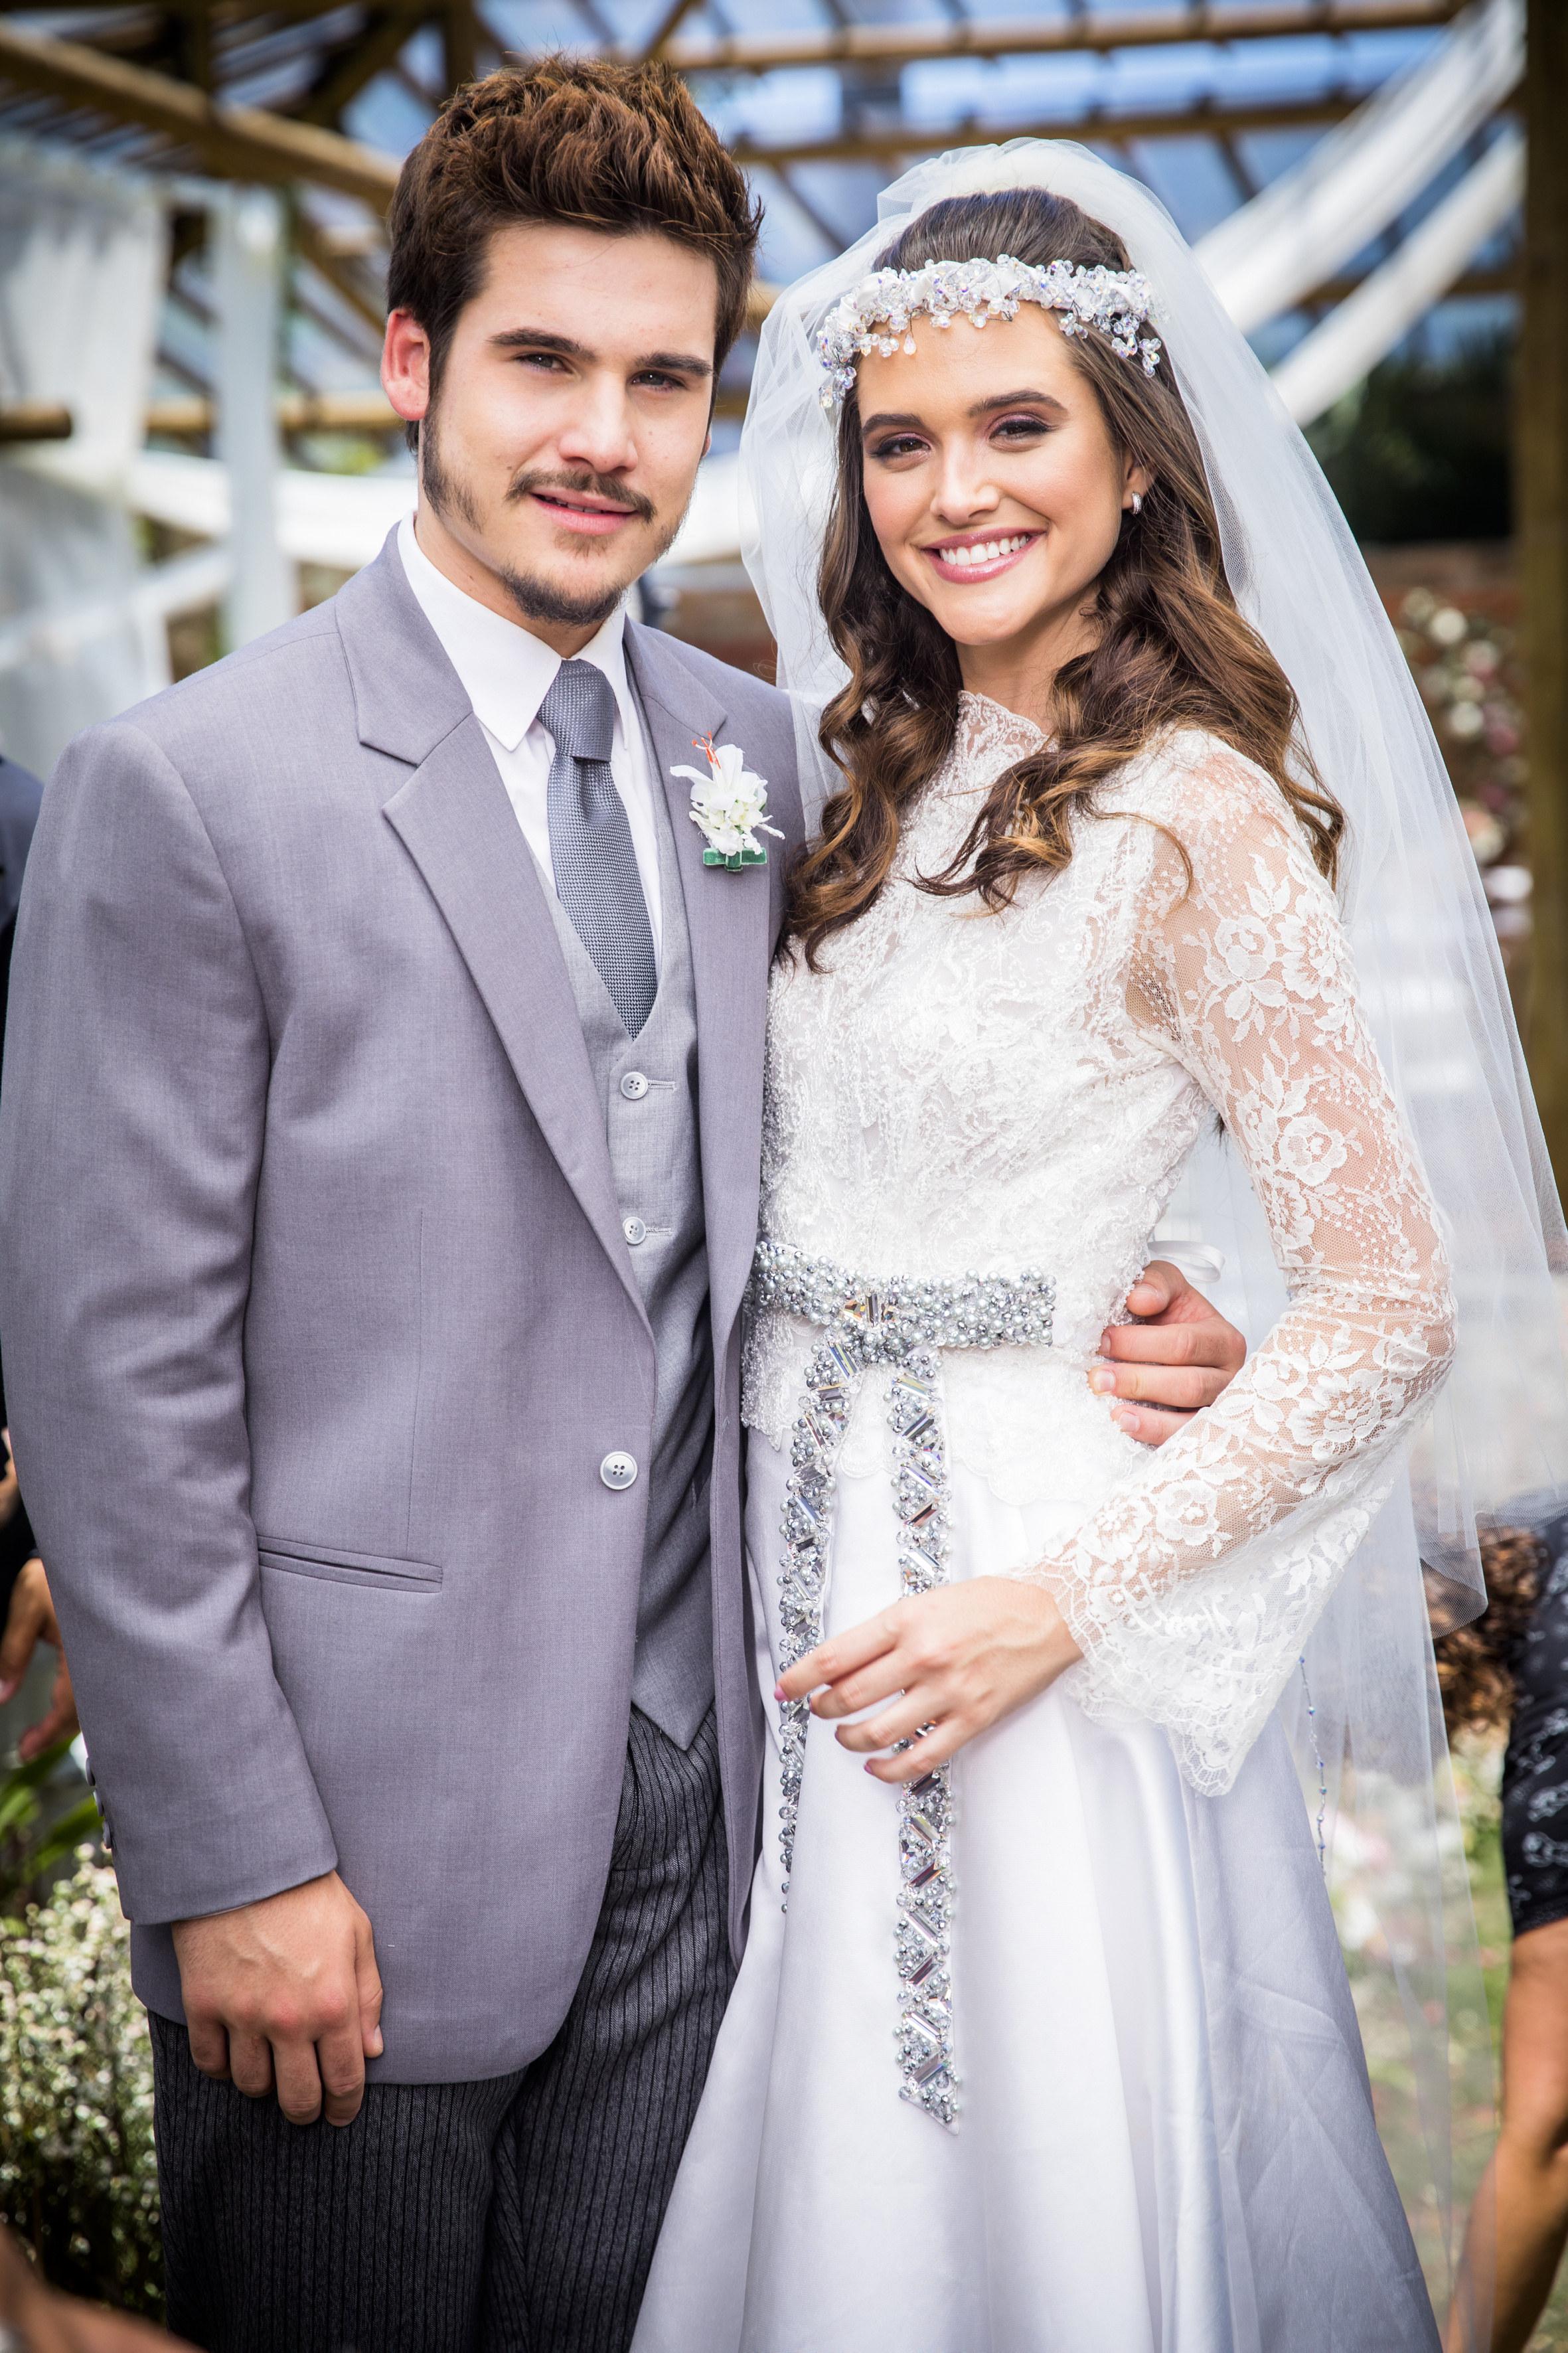 Vestido e noiva Juliana Paiva